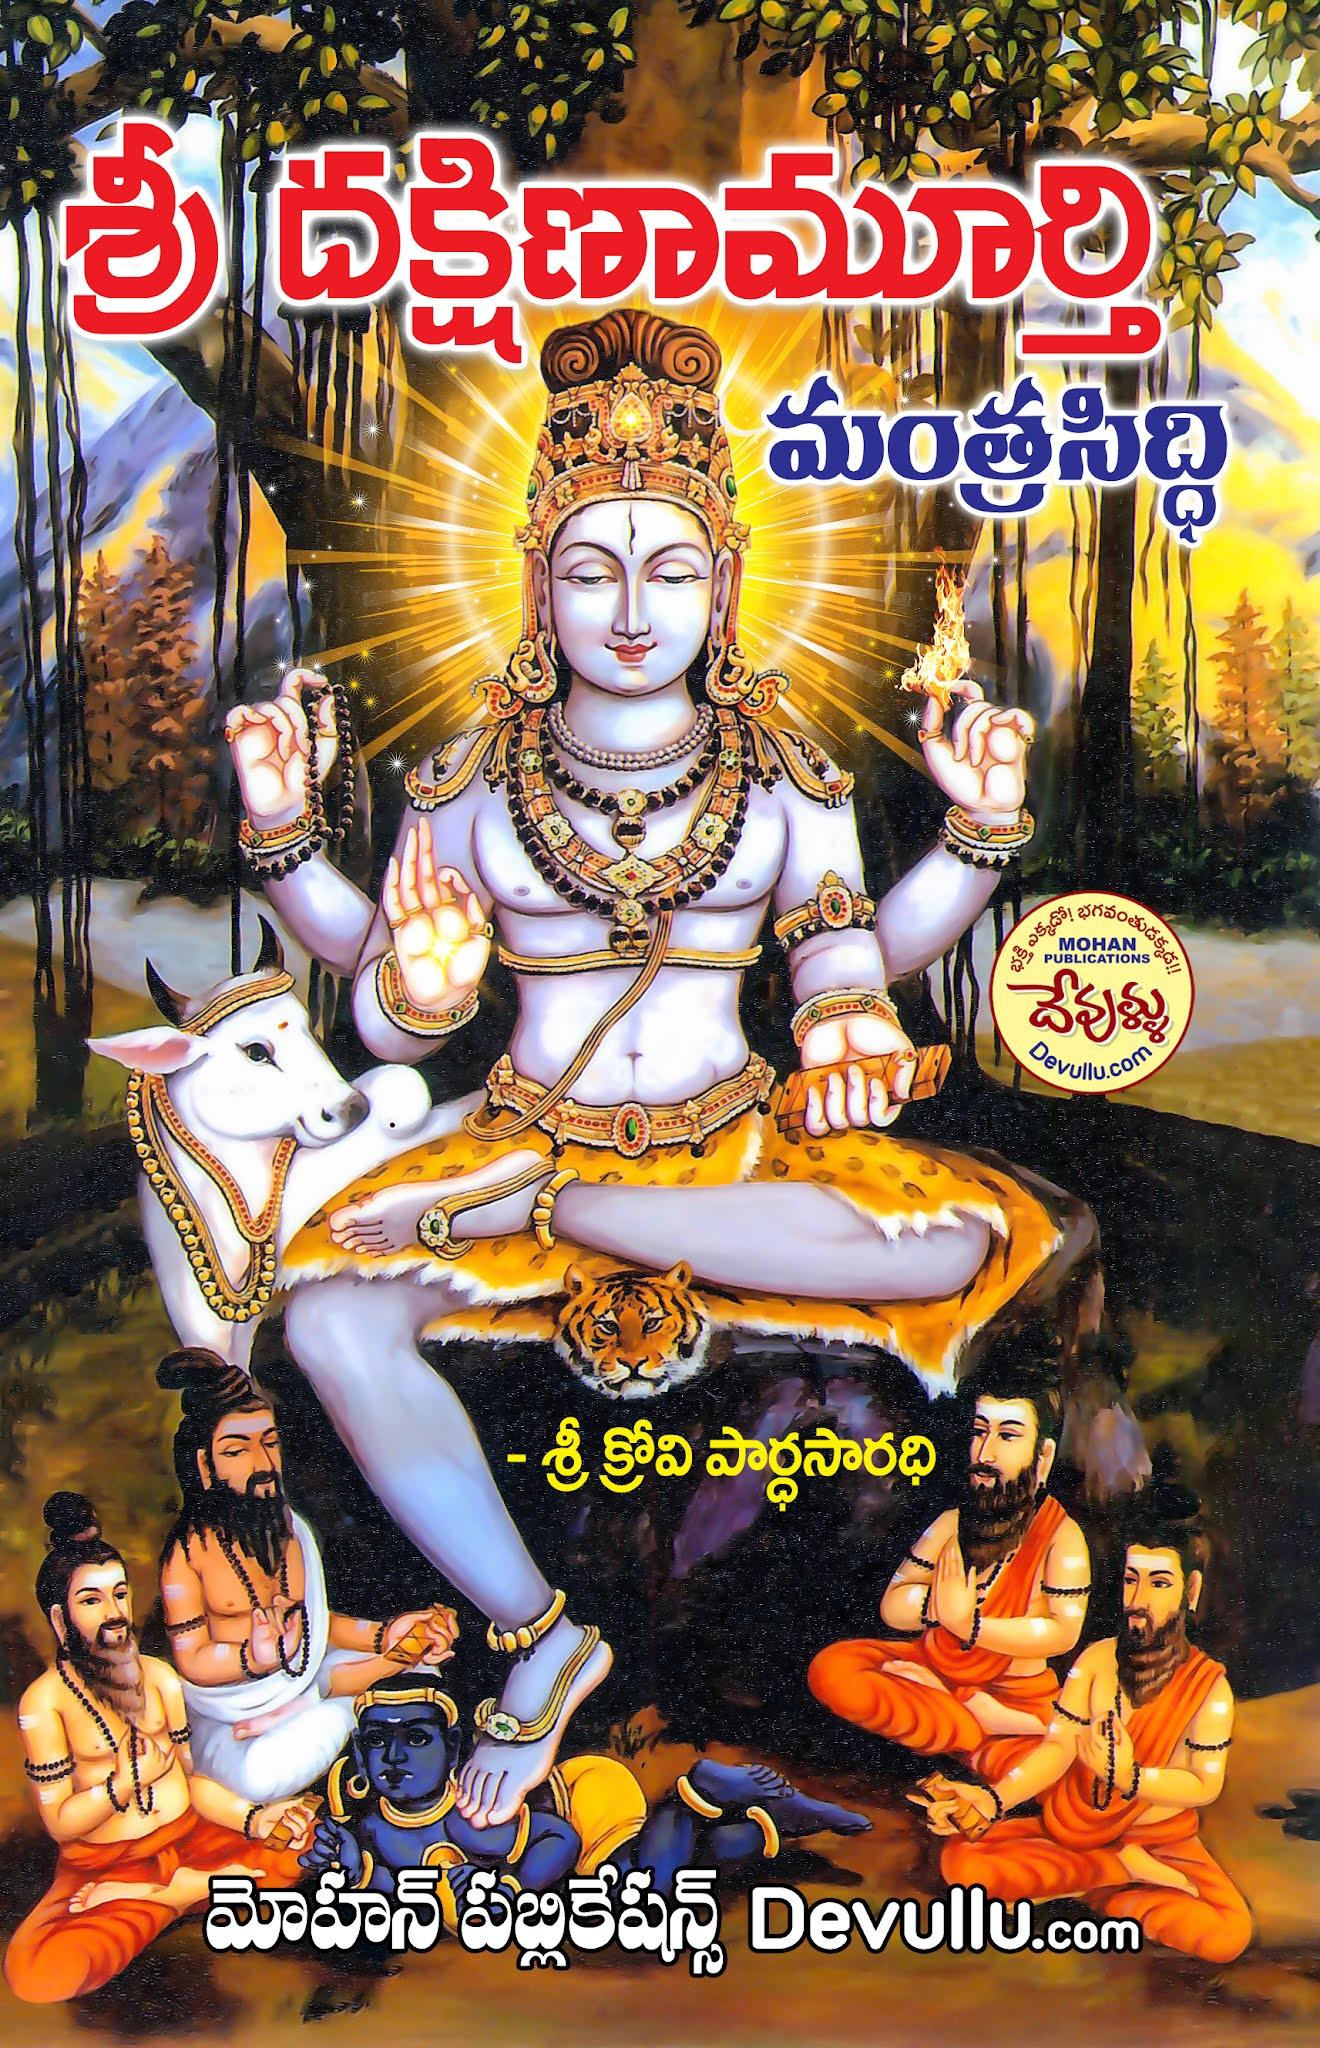 Sri Dakshinamurthy Mantra Siddhi   శ్రీ దక్షిణామూర్తి మంత్ర సిద్ధి   mantra tantra yantra books in telugu